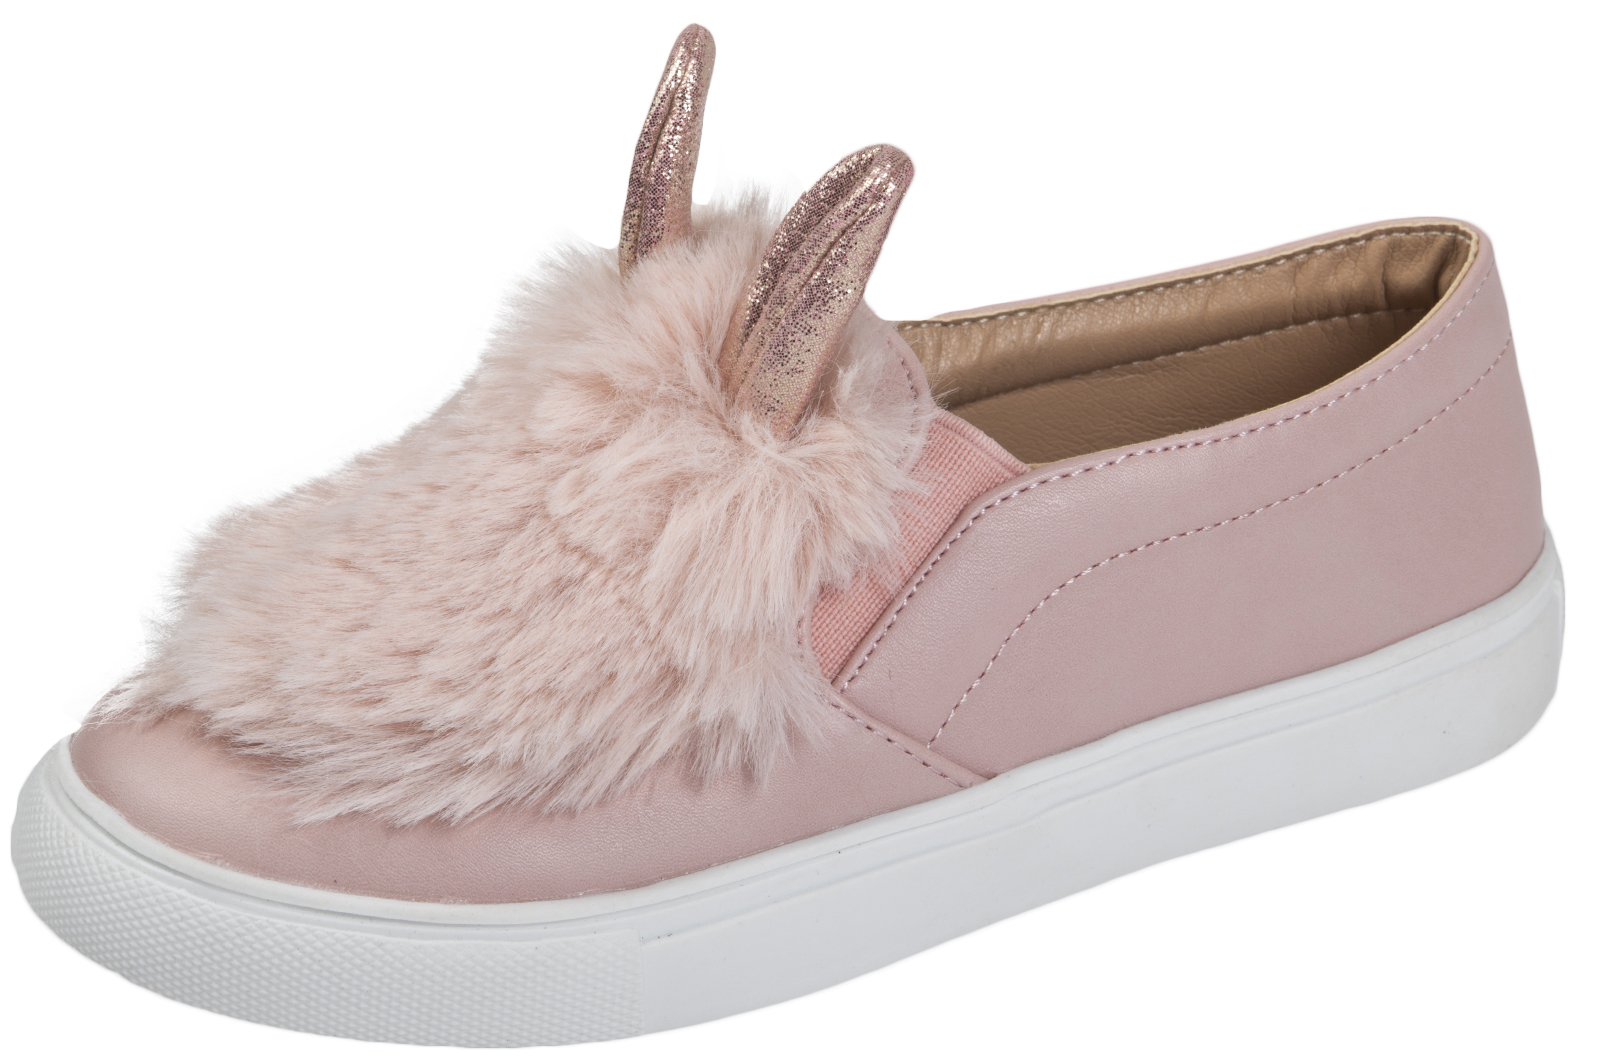 38457d66f89d Girls glitter shoes bunny ears slip on pumps casual summer jpg 1600x1063 Bunny  girls shoes